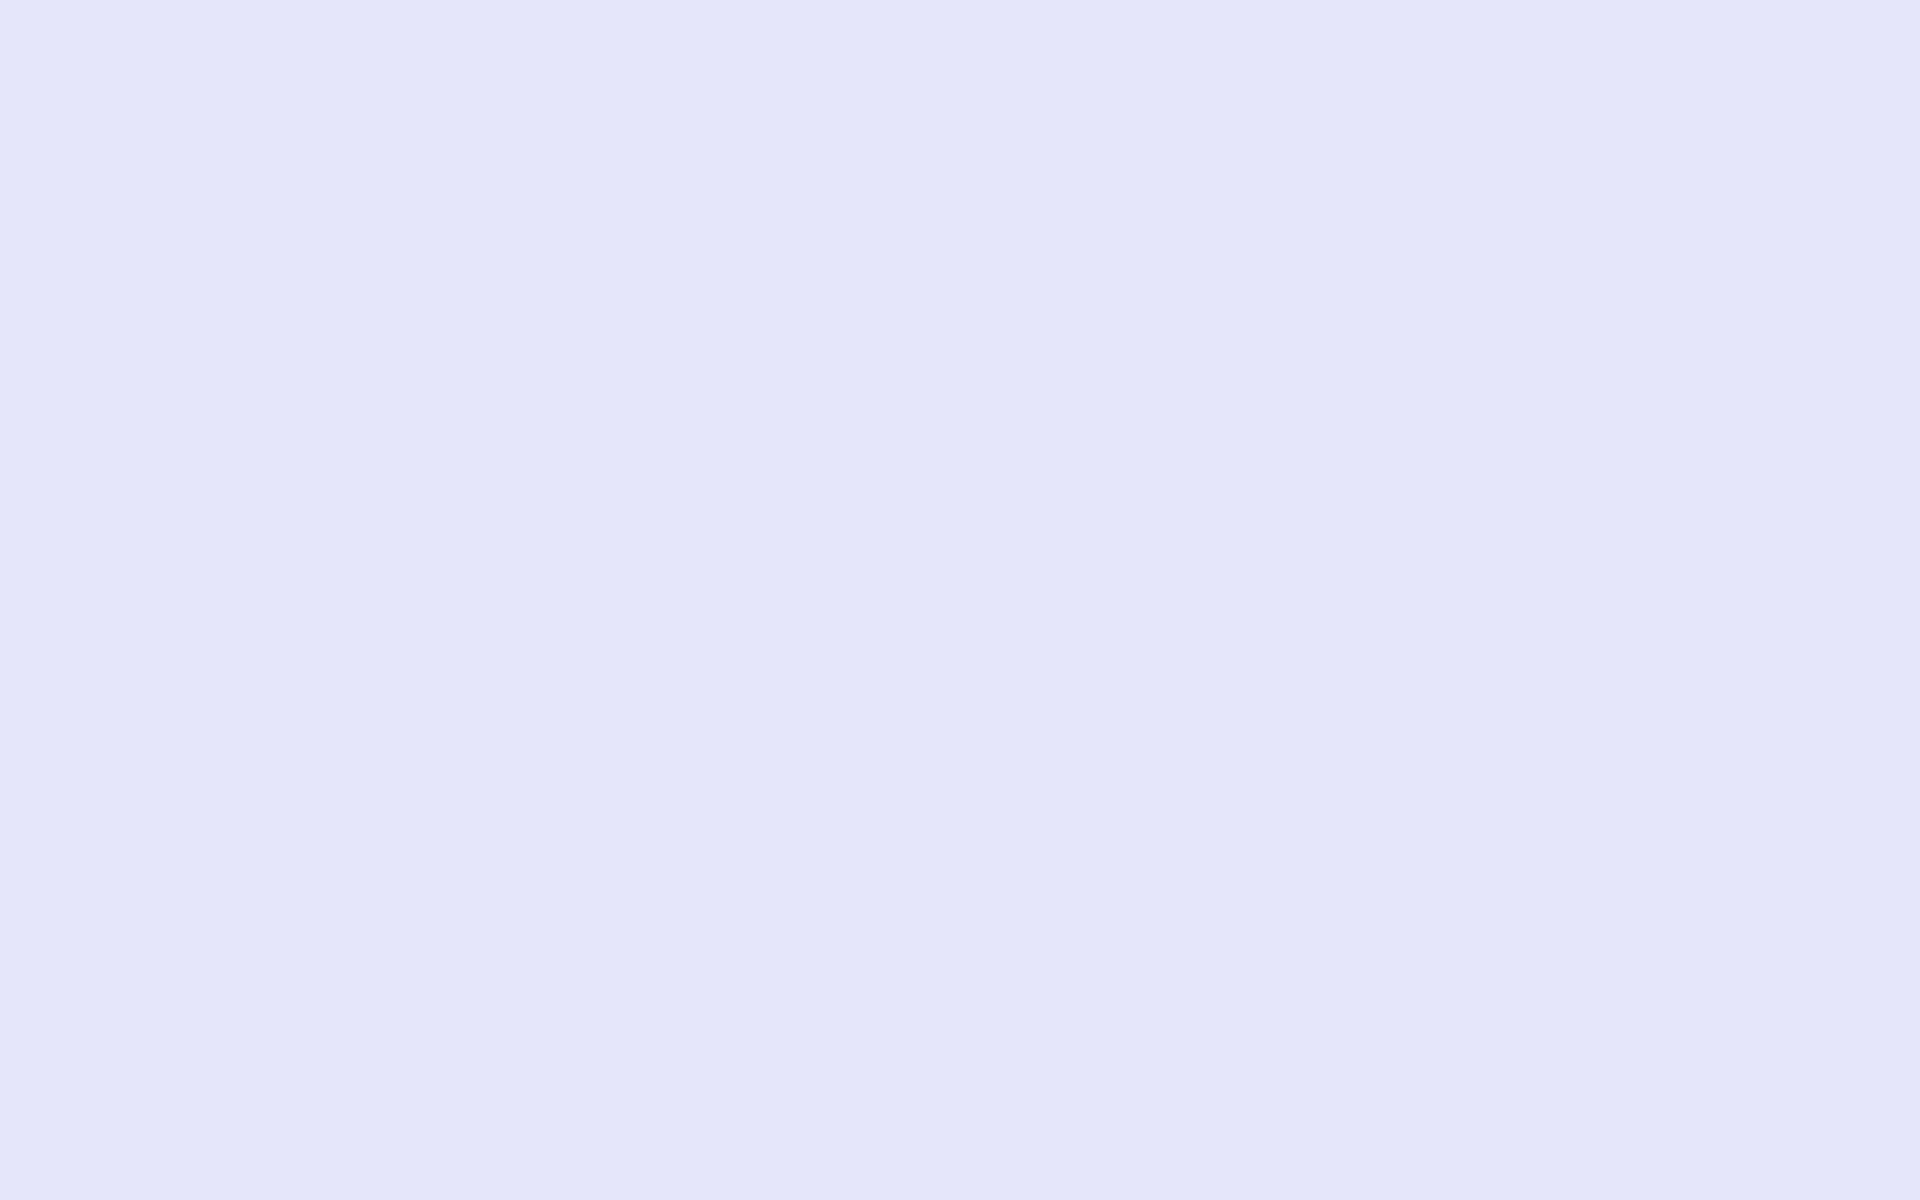 1920x1200 Lavender Web Solid Color Background